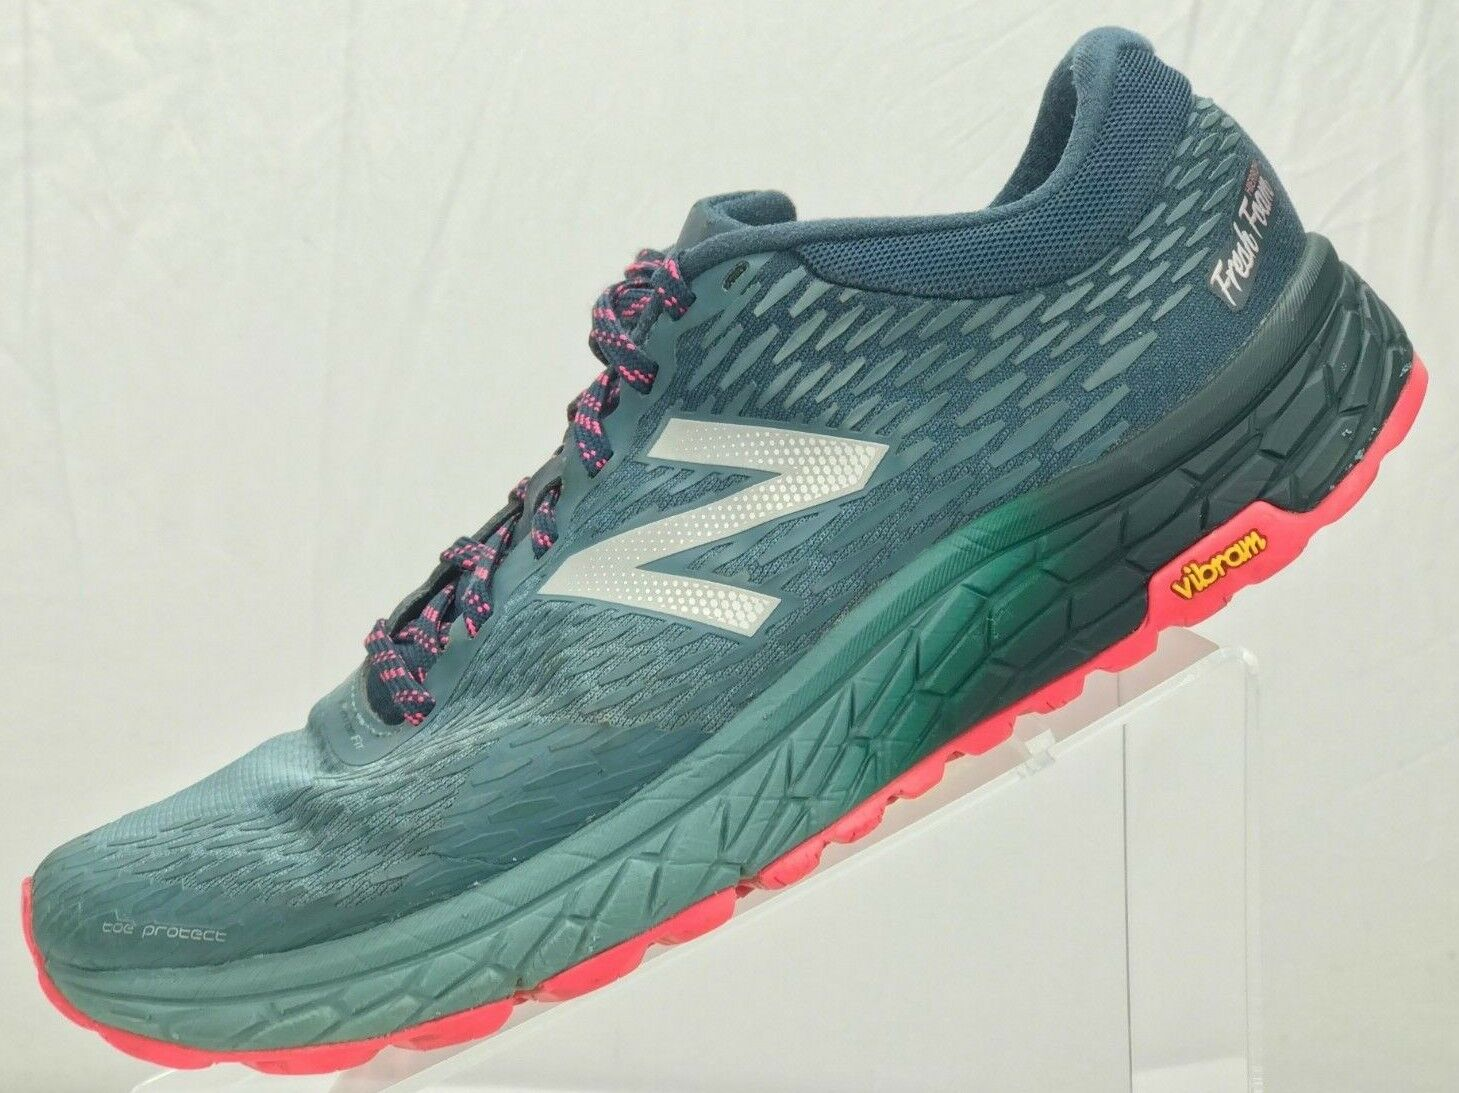 NEW BALANCE Fresh Foam Hierro Trail Running Sneaker - Women's 9.5B Green Pink